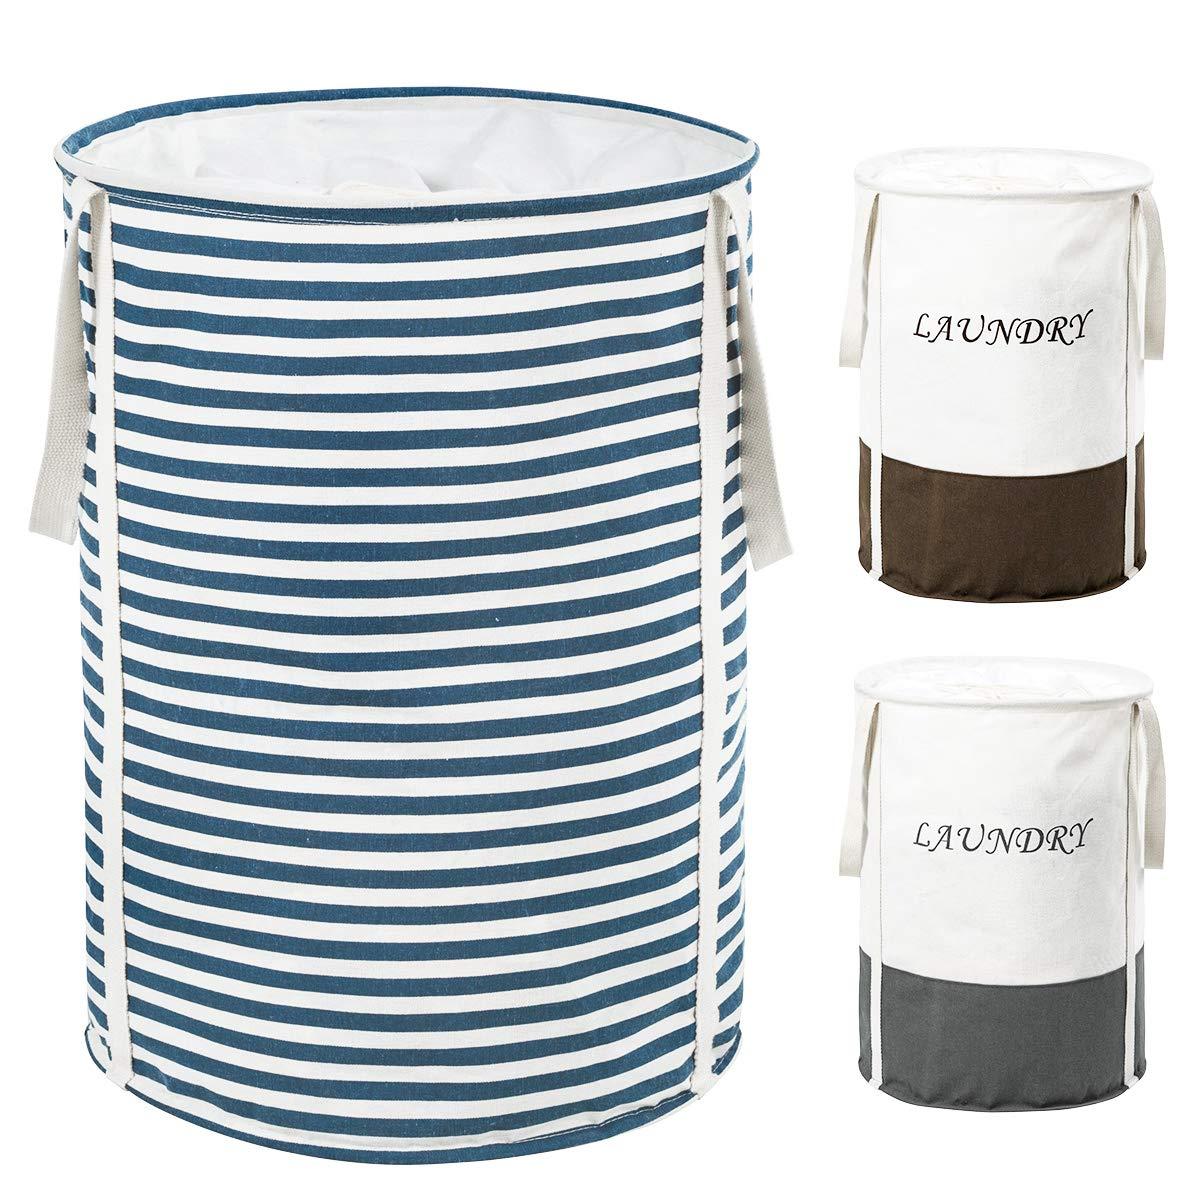 ZERO JET LAG 19 in Collapsible Laundry Hamper with Handles Drawstring Round Cotton Basket Kids Nursery Hamper Storage Blue Strips